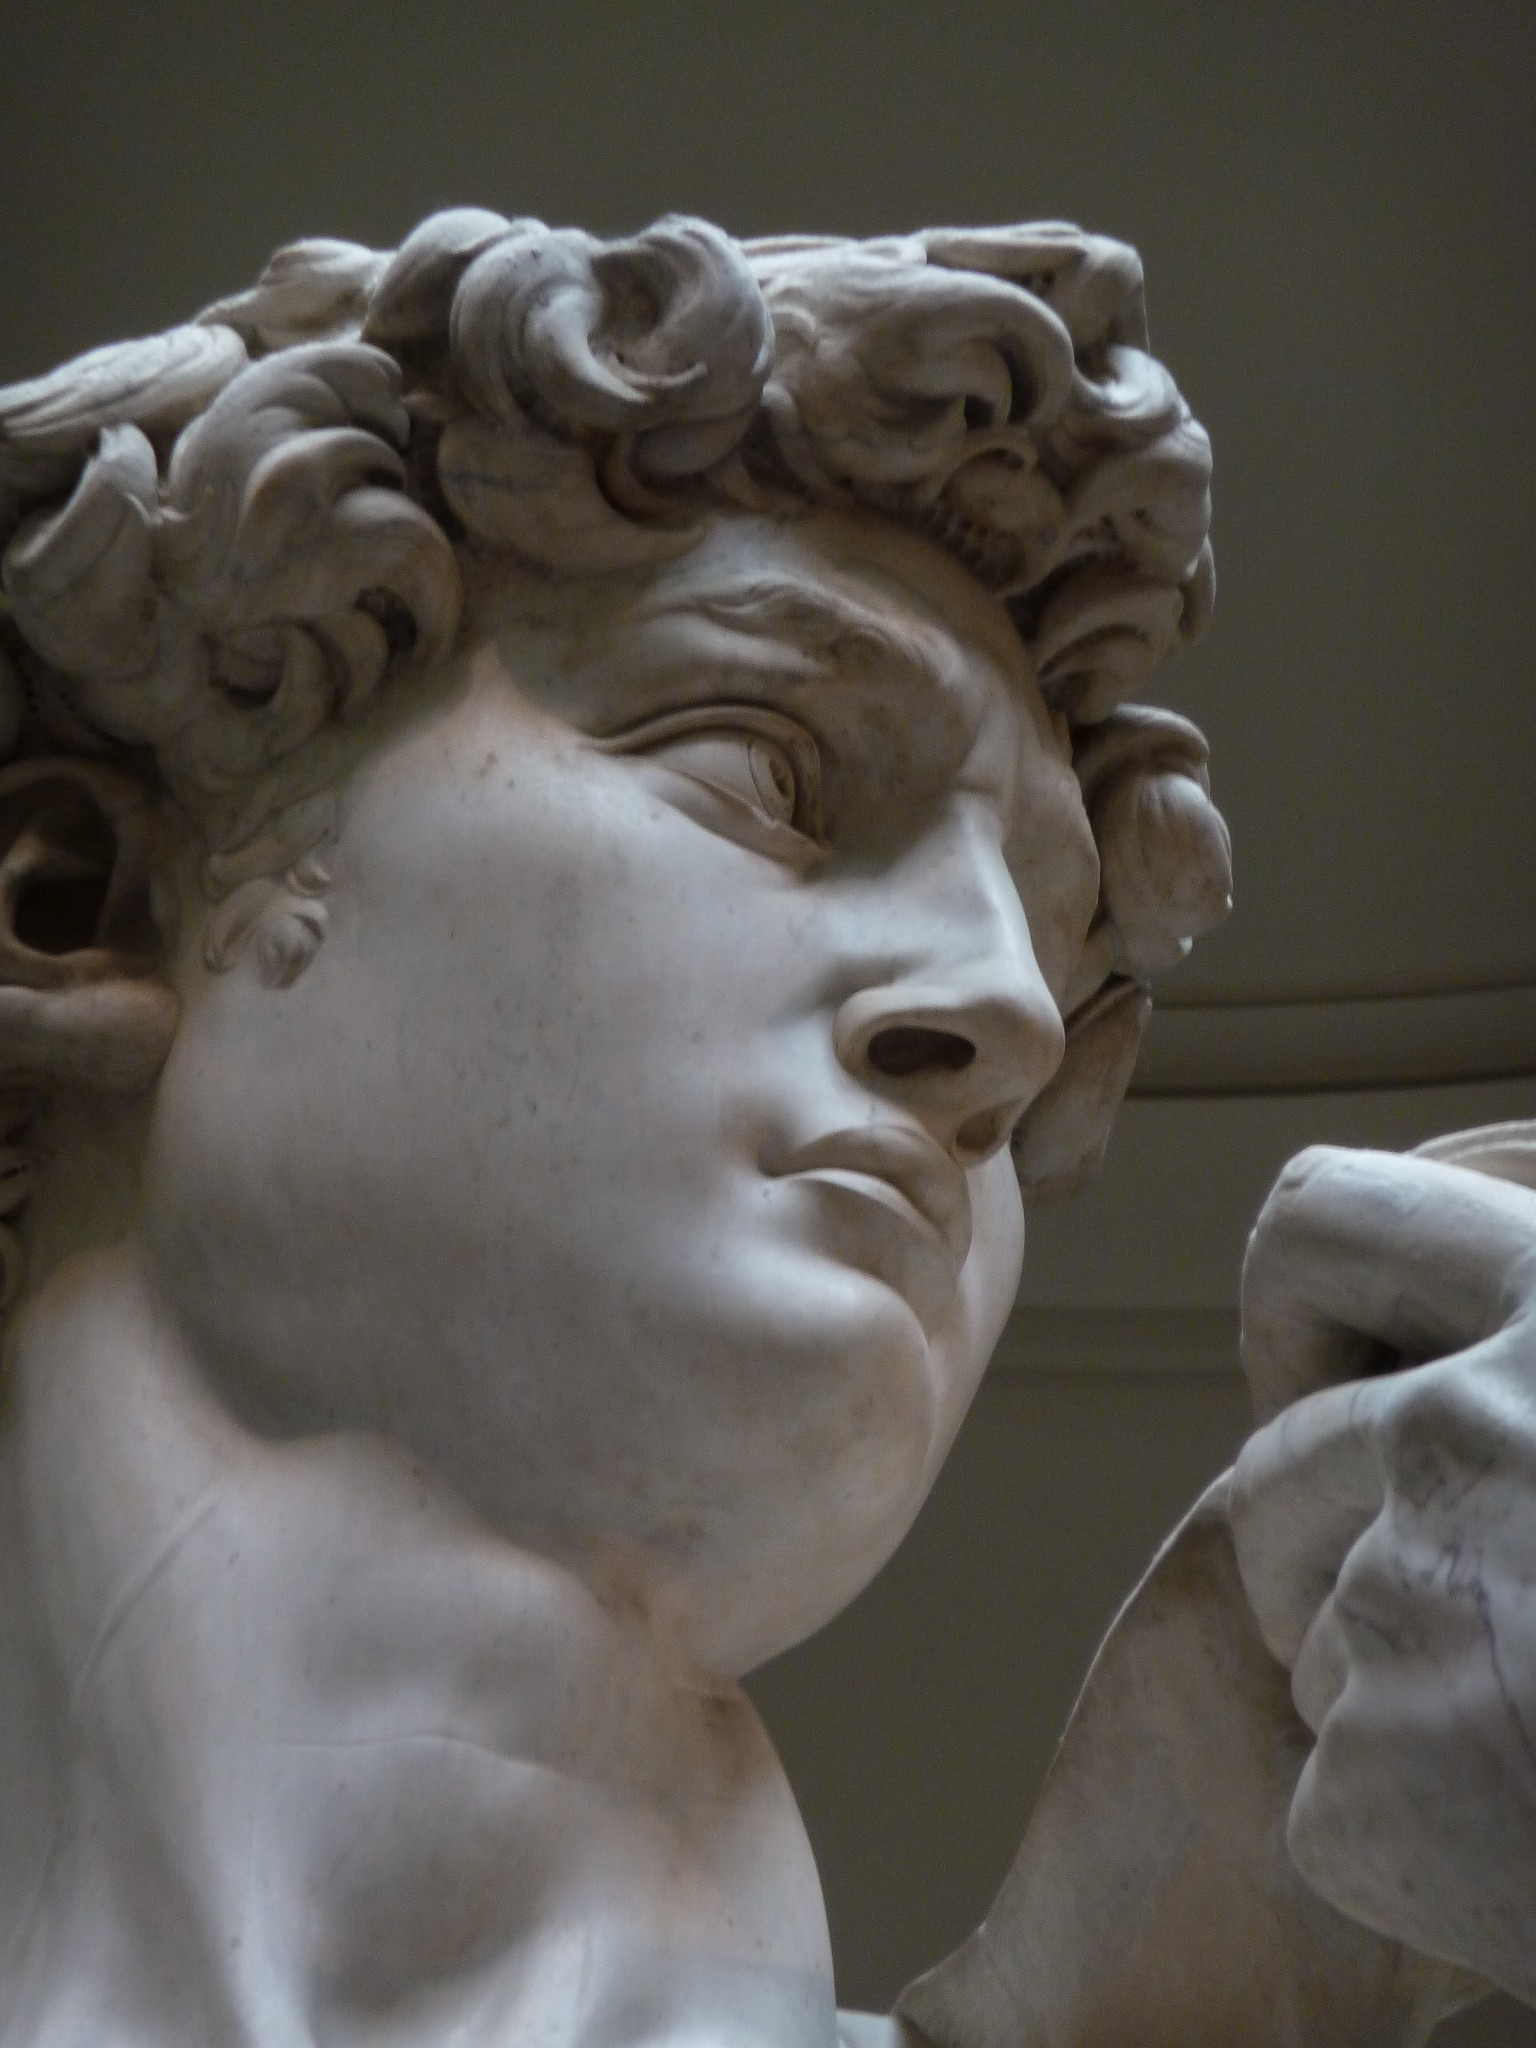 Давид работы Микеланджело | Artifex.ru